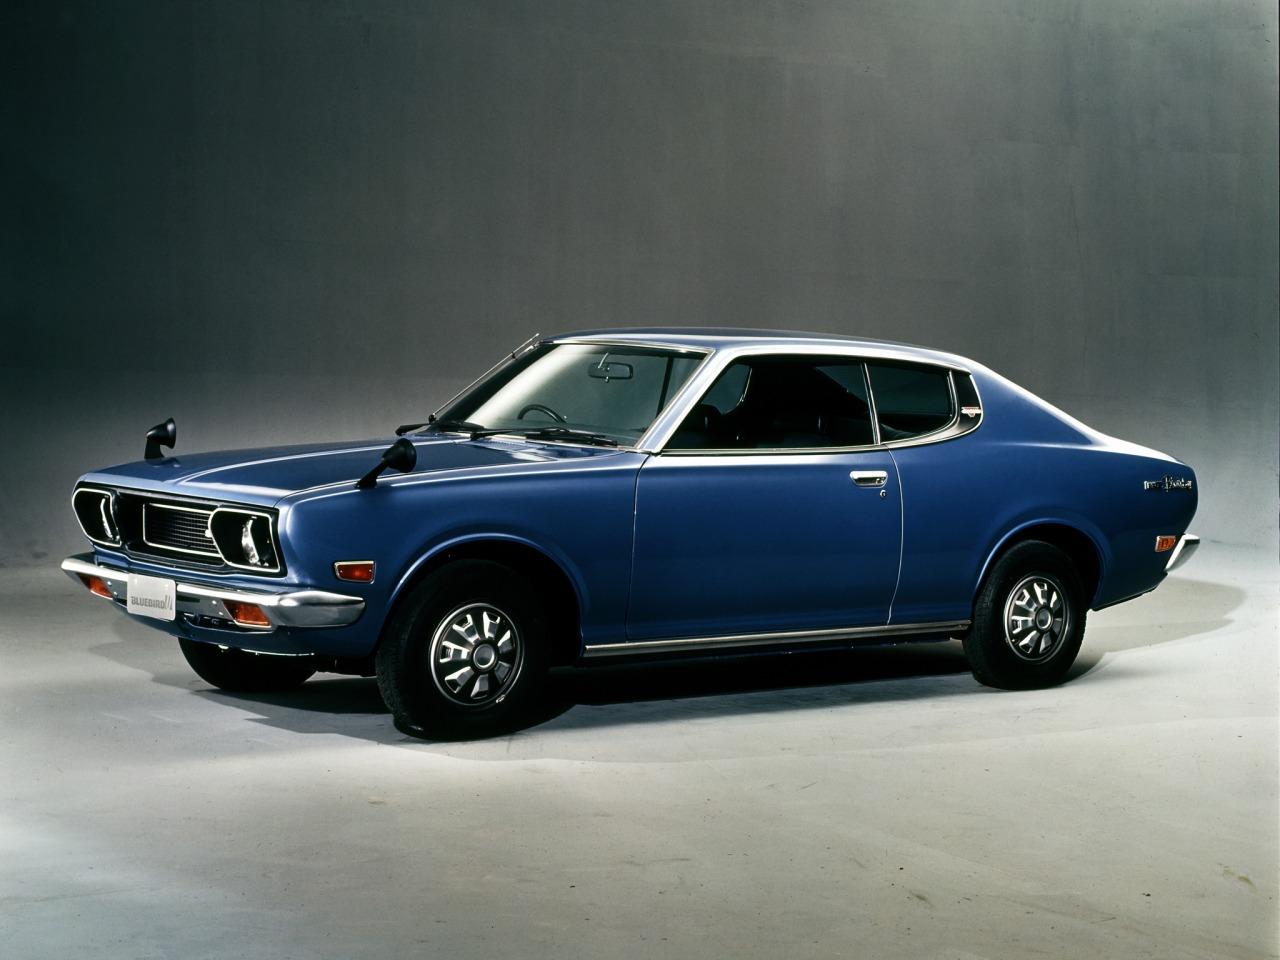 Nissan Bluebird IV (610) 1971 - 1976 Sedan #5